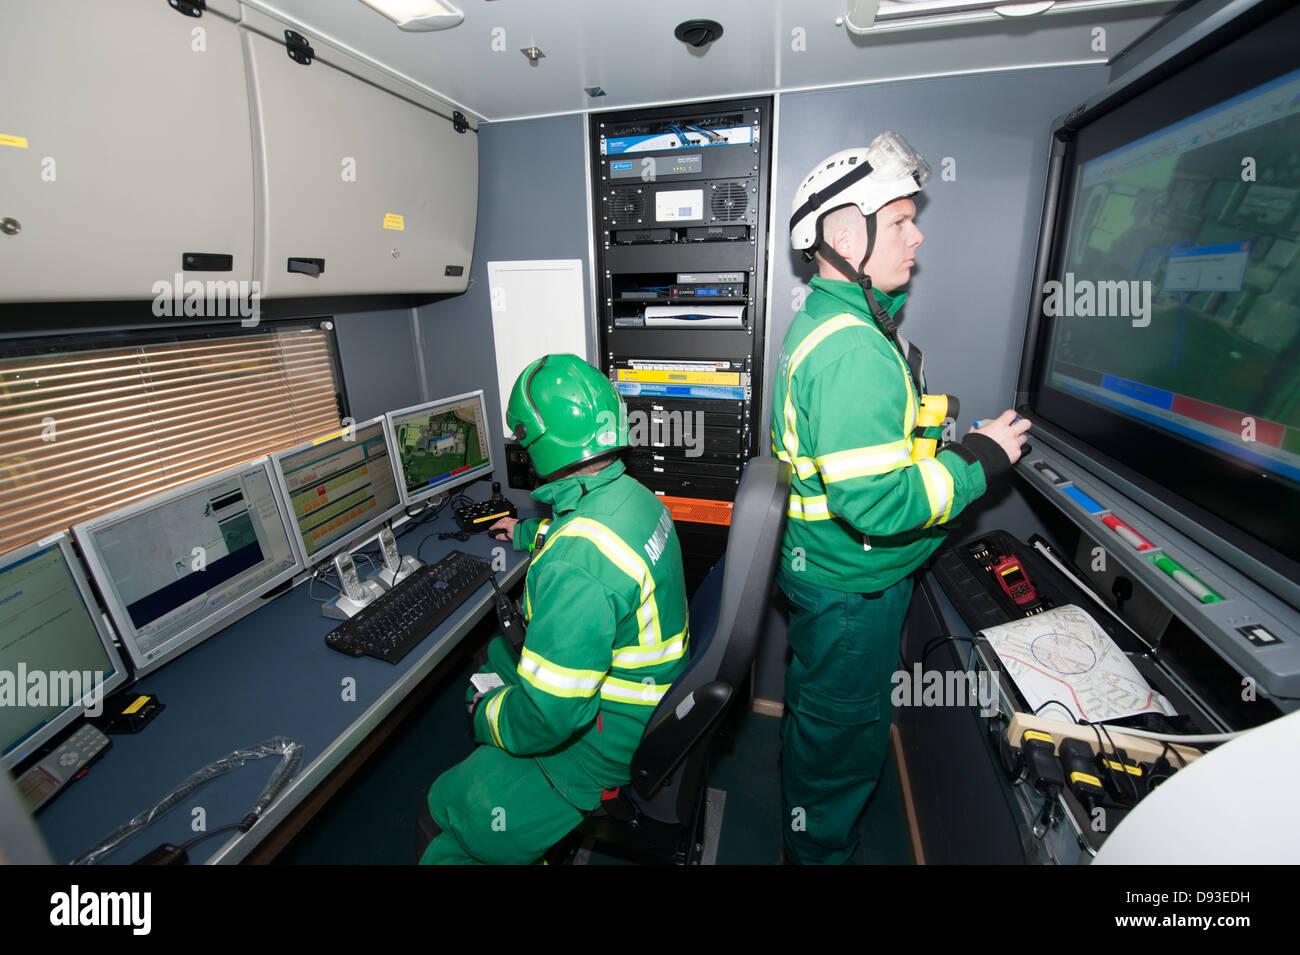 Ambulance HART Paramedic Major Incident Command Unit - Stock Image